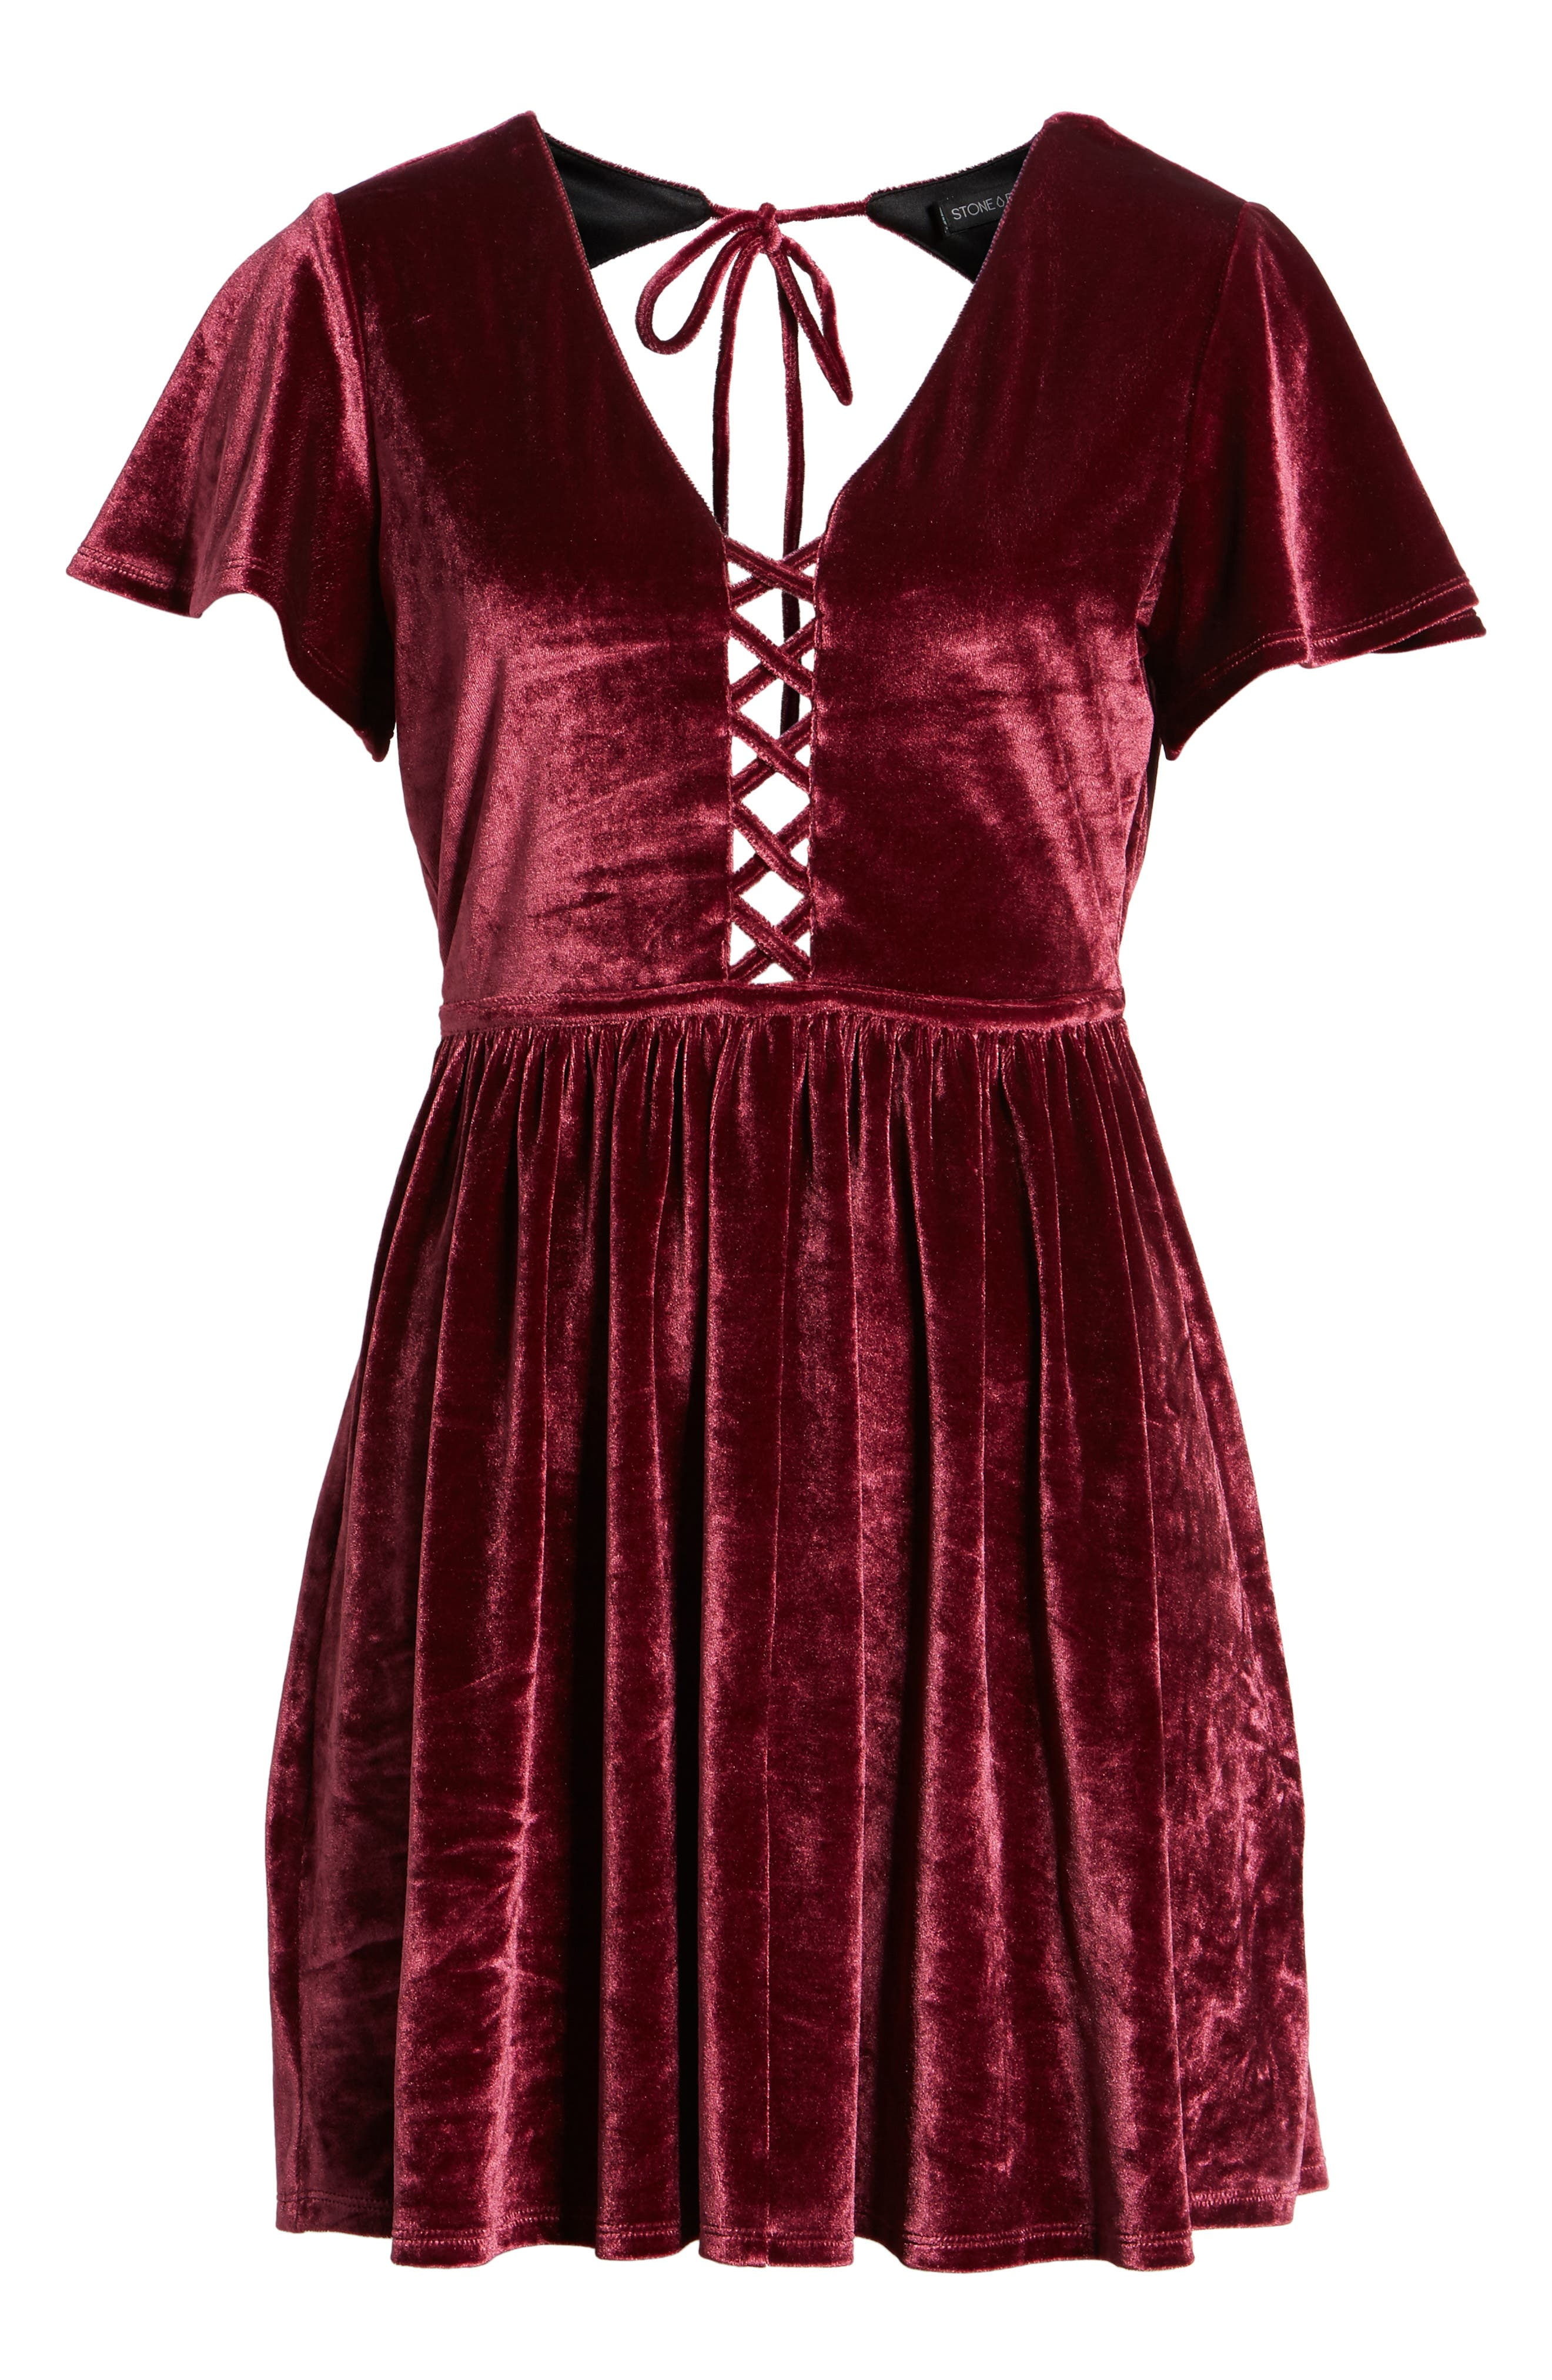 Velvacious Dress,                             Alternate thumbnail 6, color,                             930